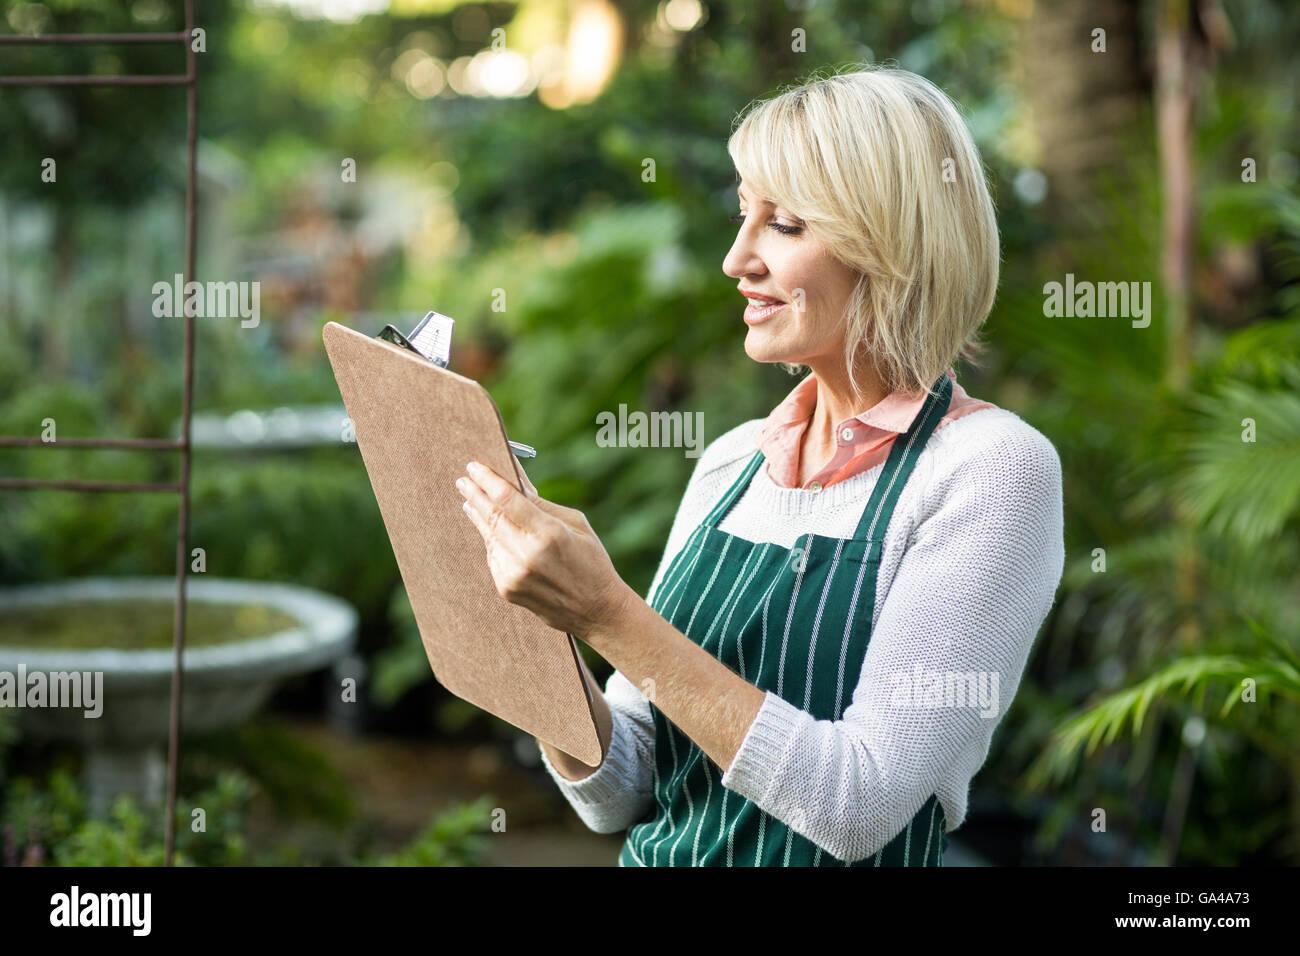 Female gardener writing in clipboard - Stock Image